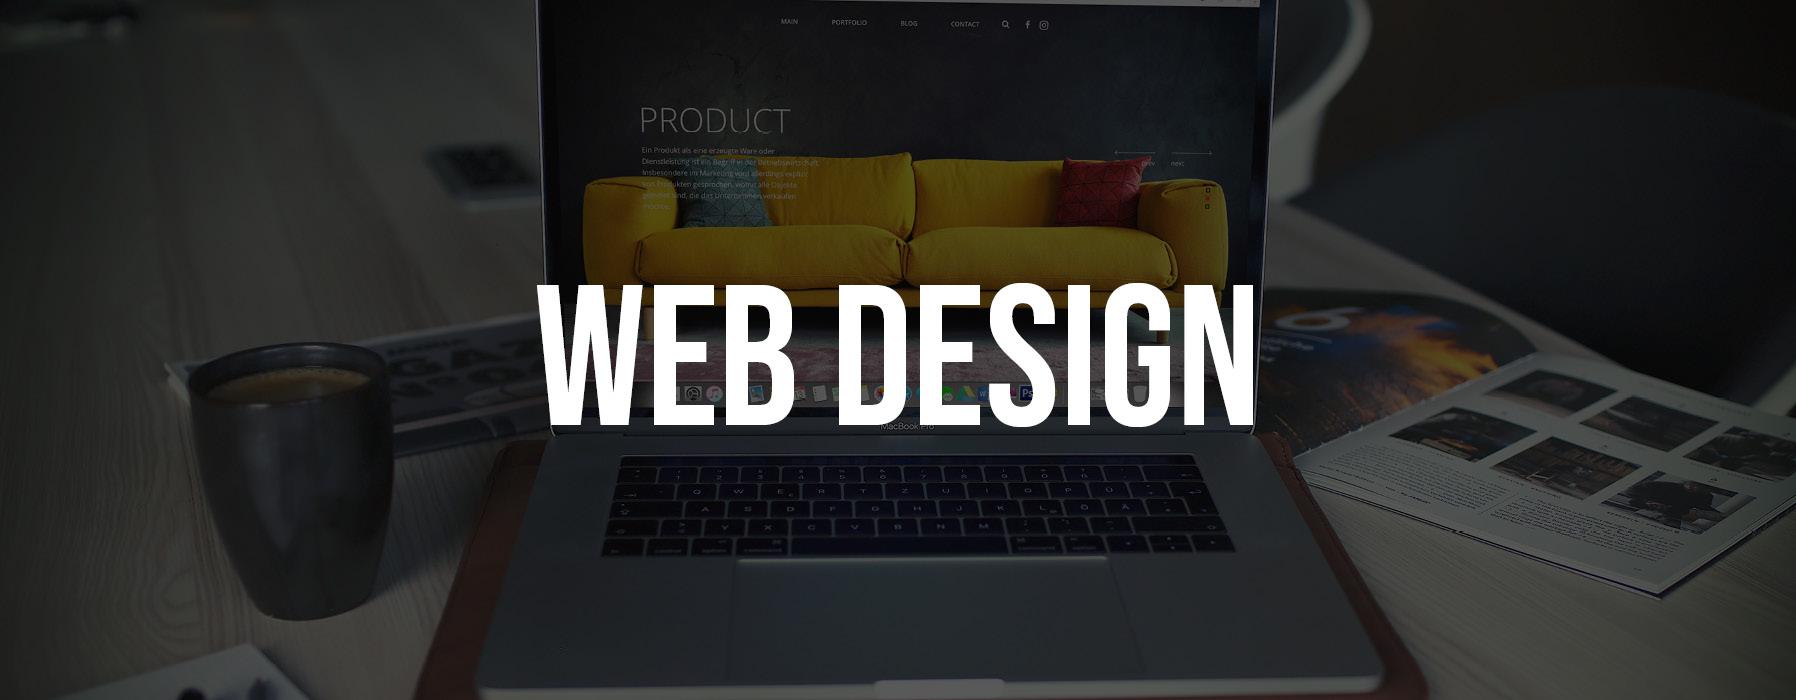 website icons4.jpg